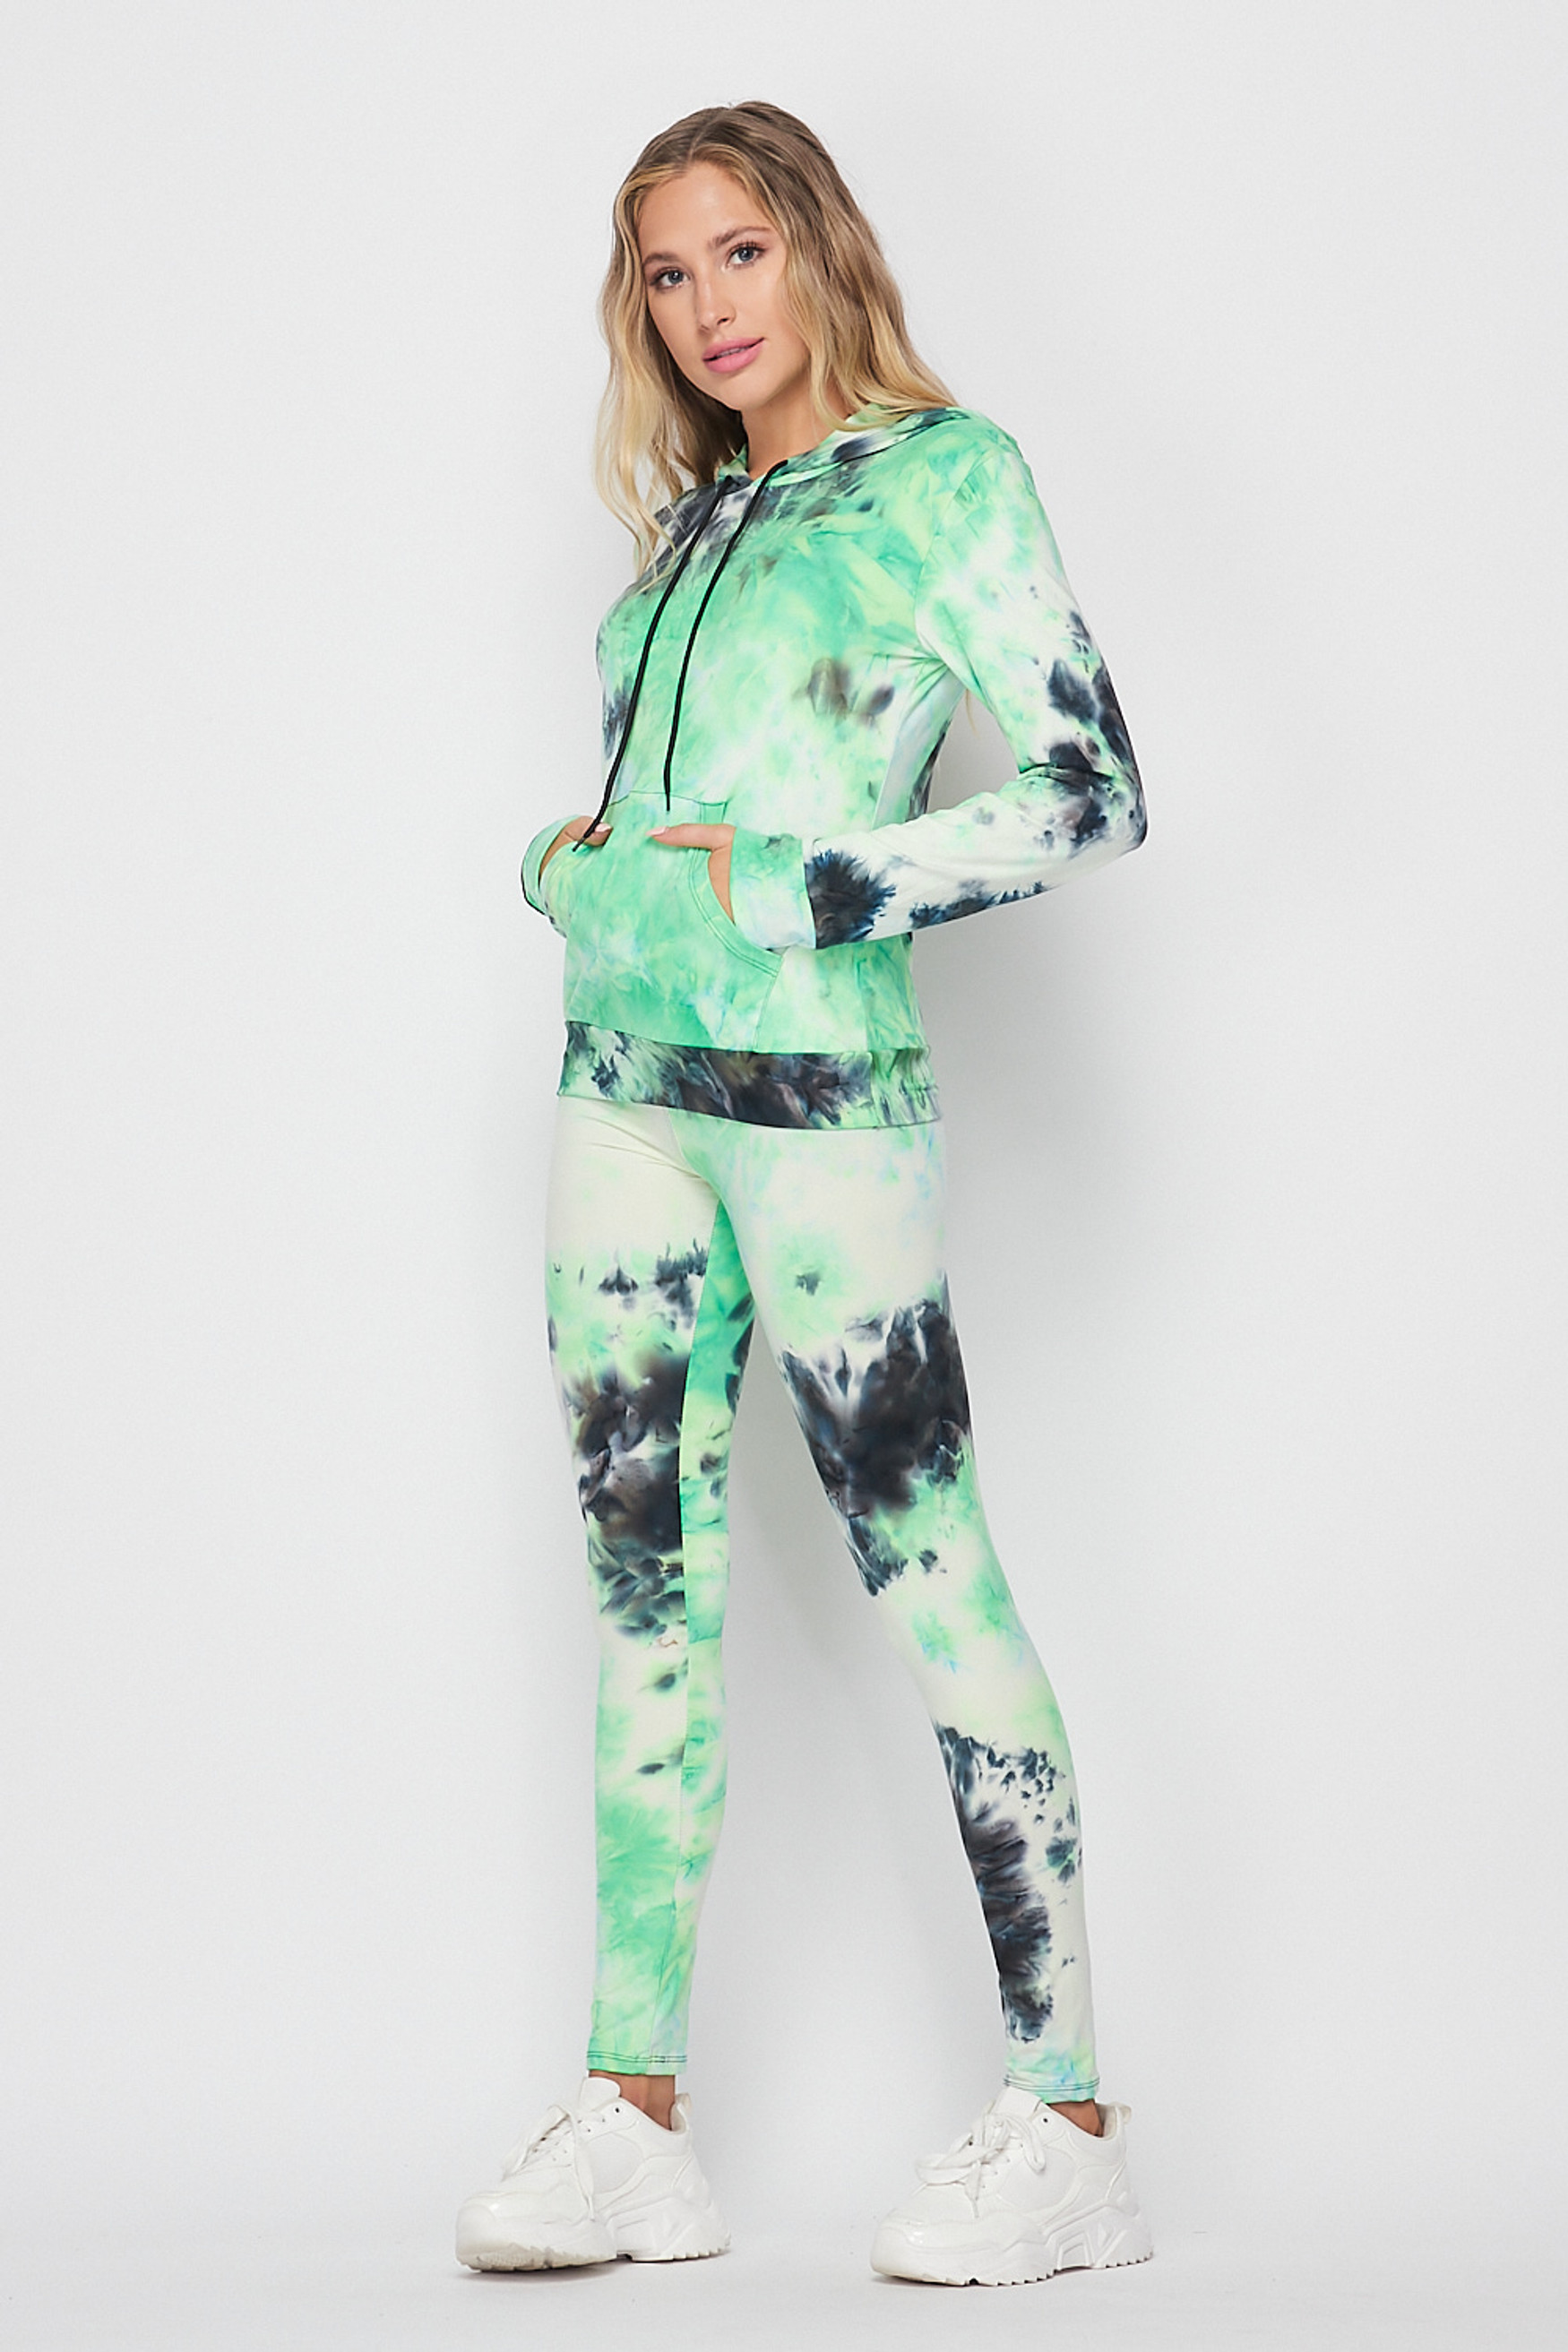 Left side image of Green Tie Dye 2 Piece Leggings and Hooded Jacket Set